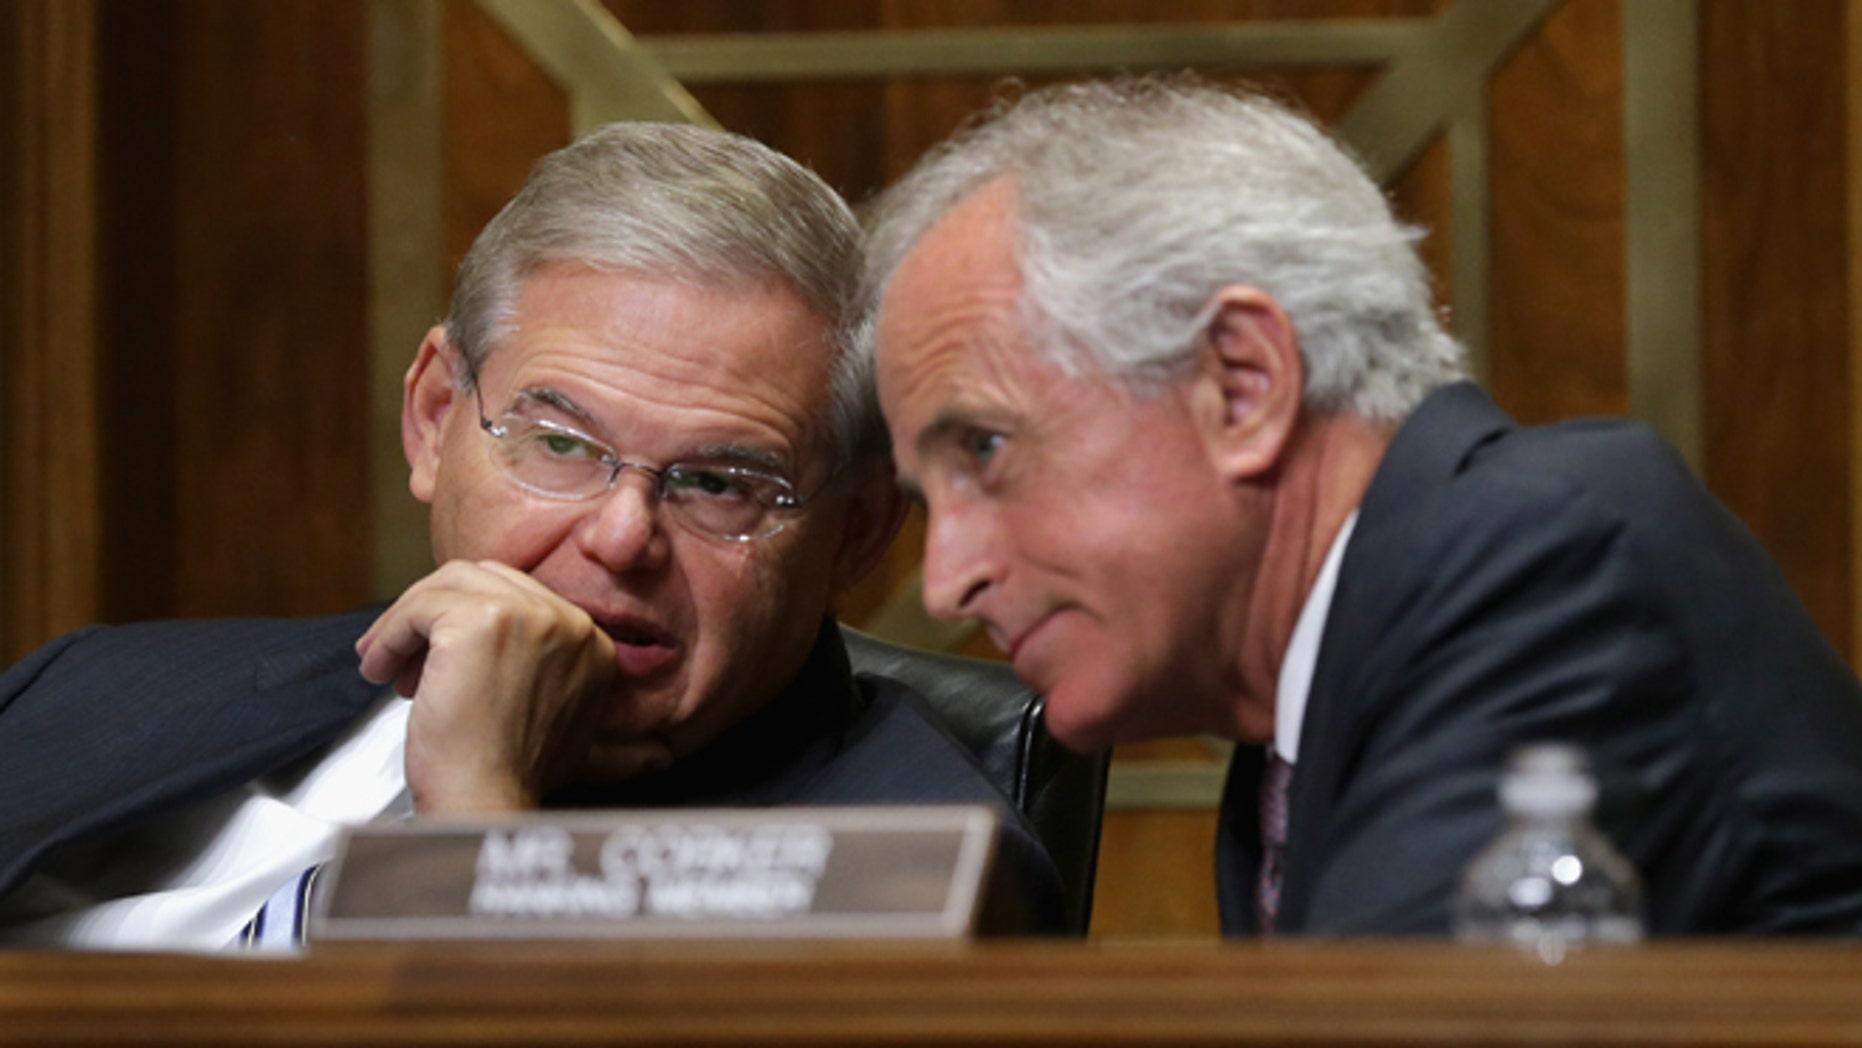 Sen. Robert Menendez, D-N.J., right, and Sen. Bob Corker, R-Tenn. talk on Capitol Hill in Washington. (Photo by Chip Somodevilla/Getty Images)